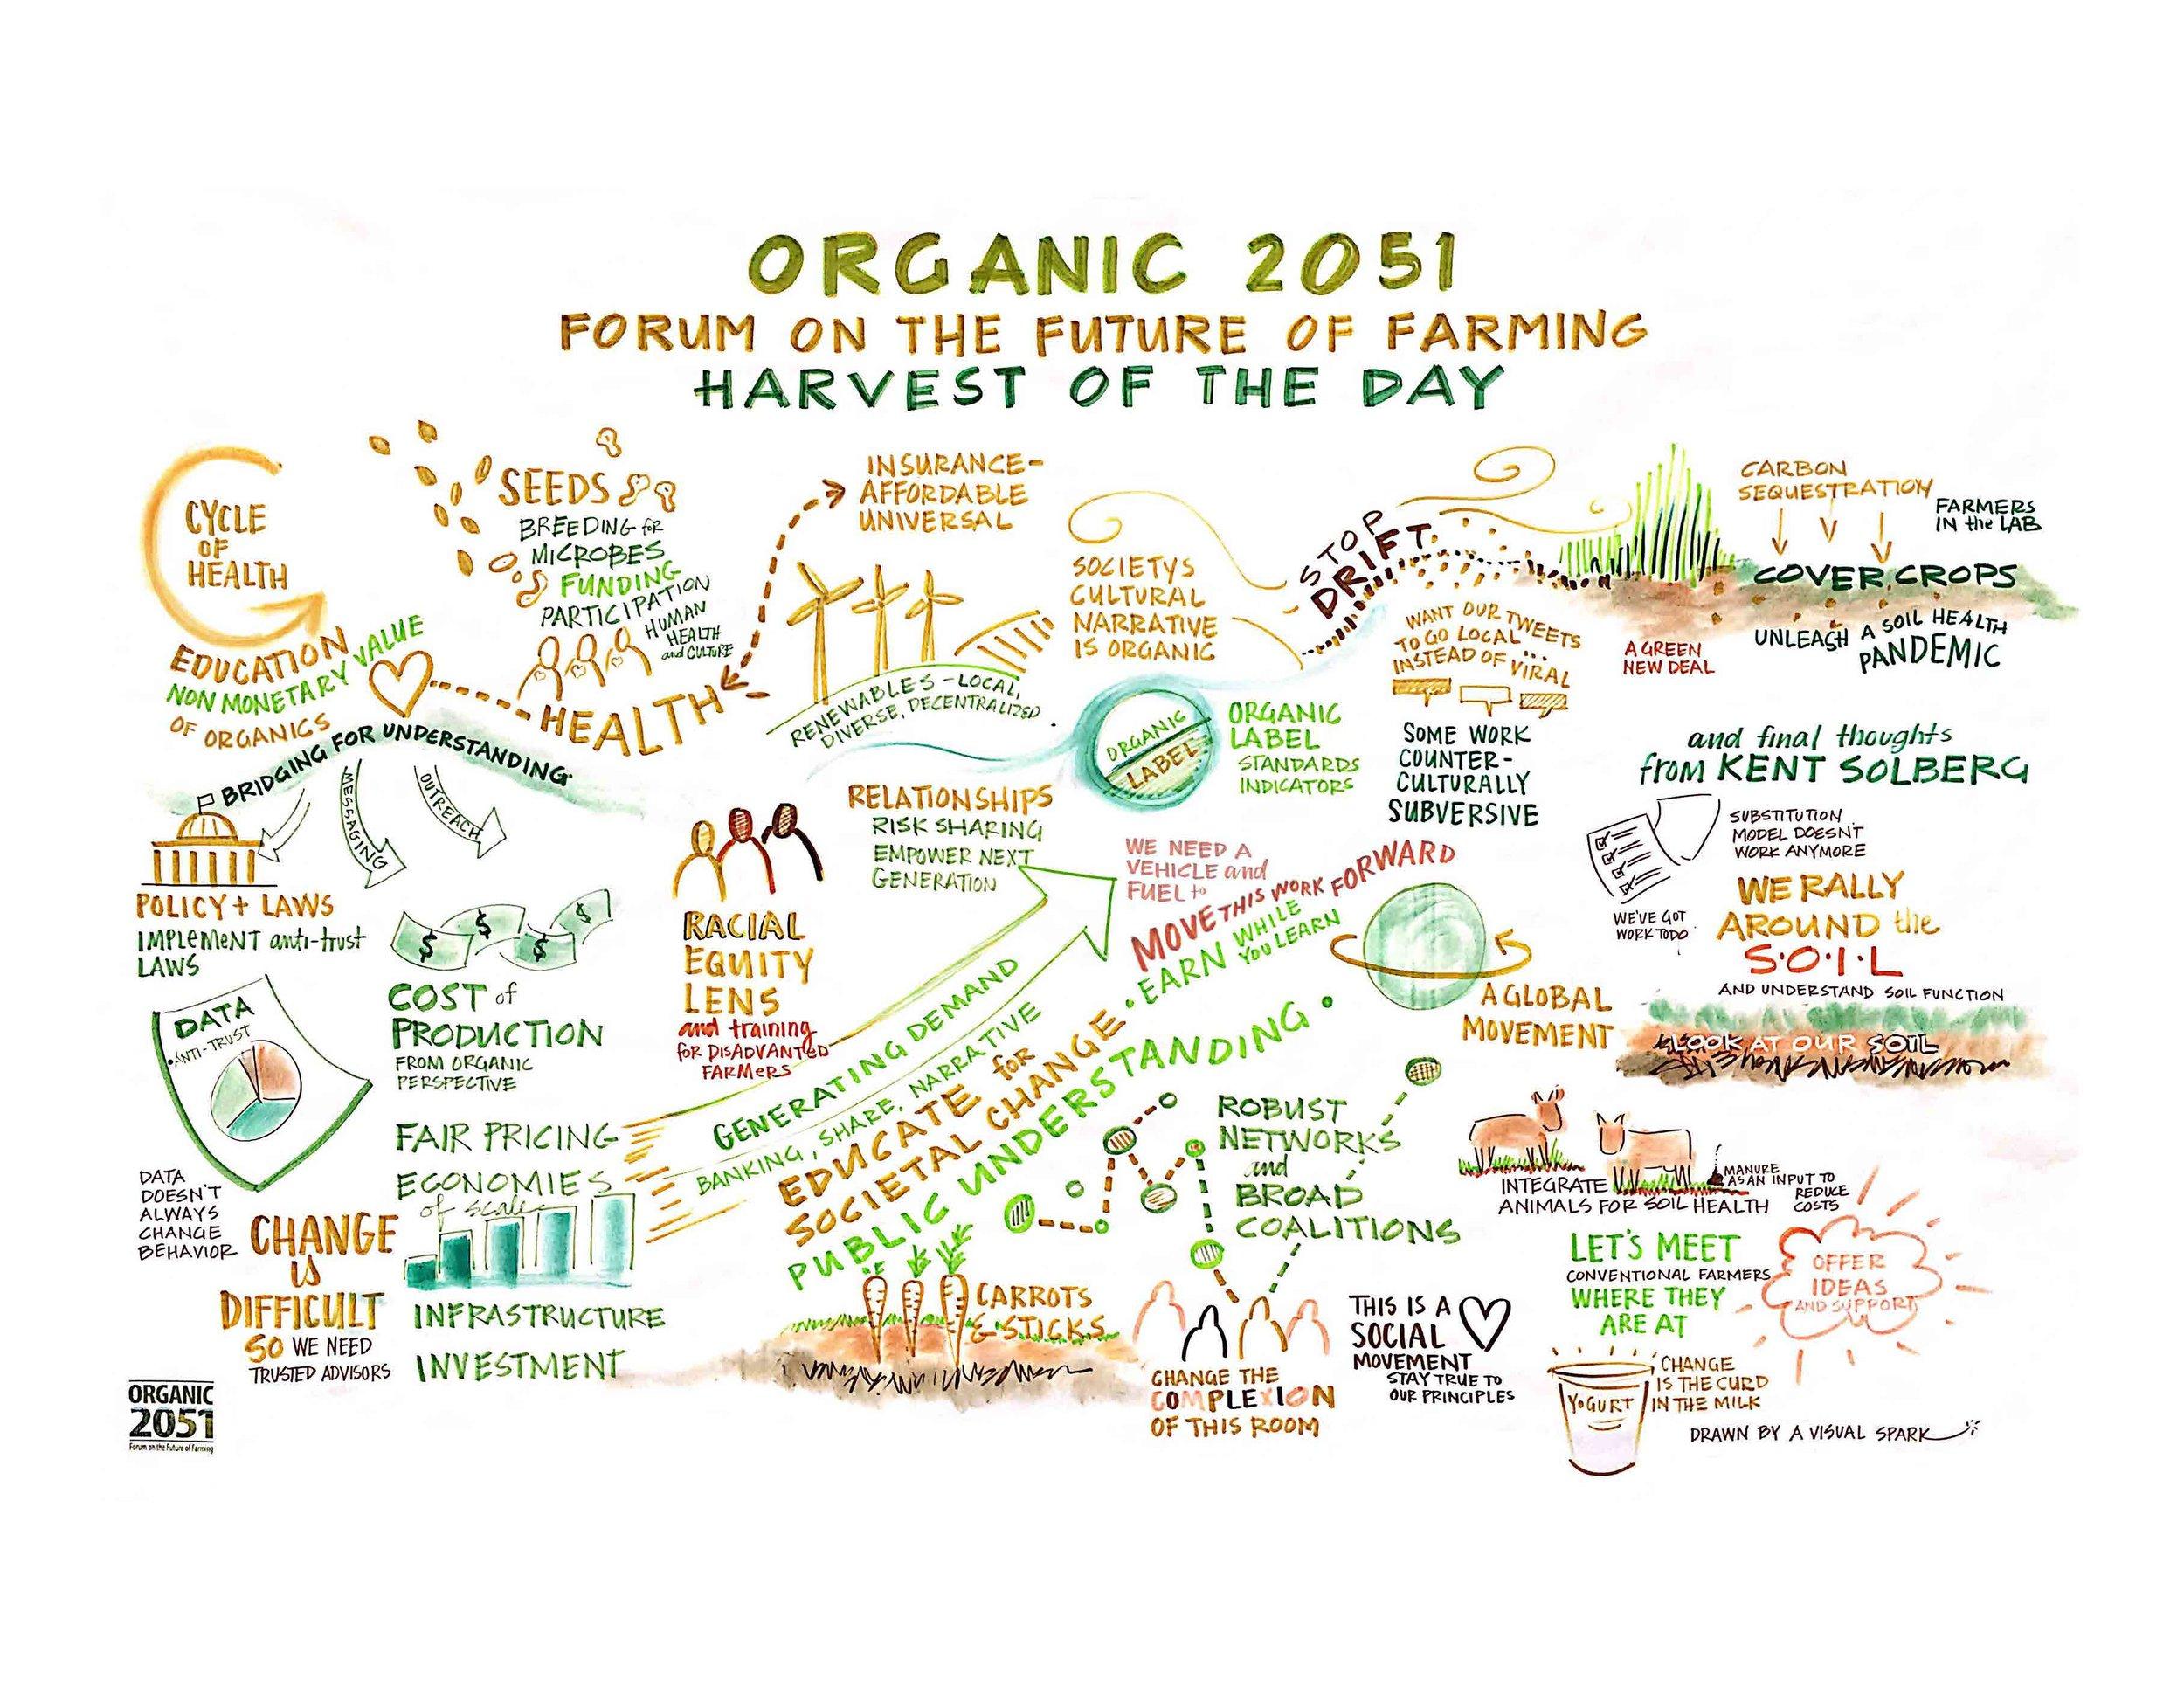 Harvest Organic 2051.jpg